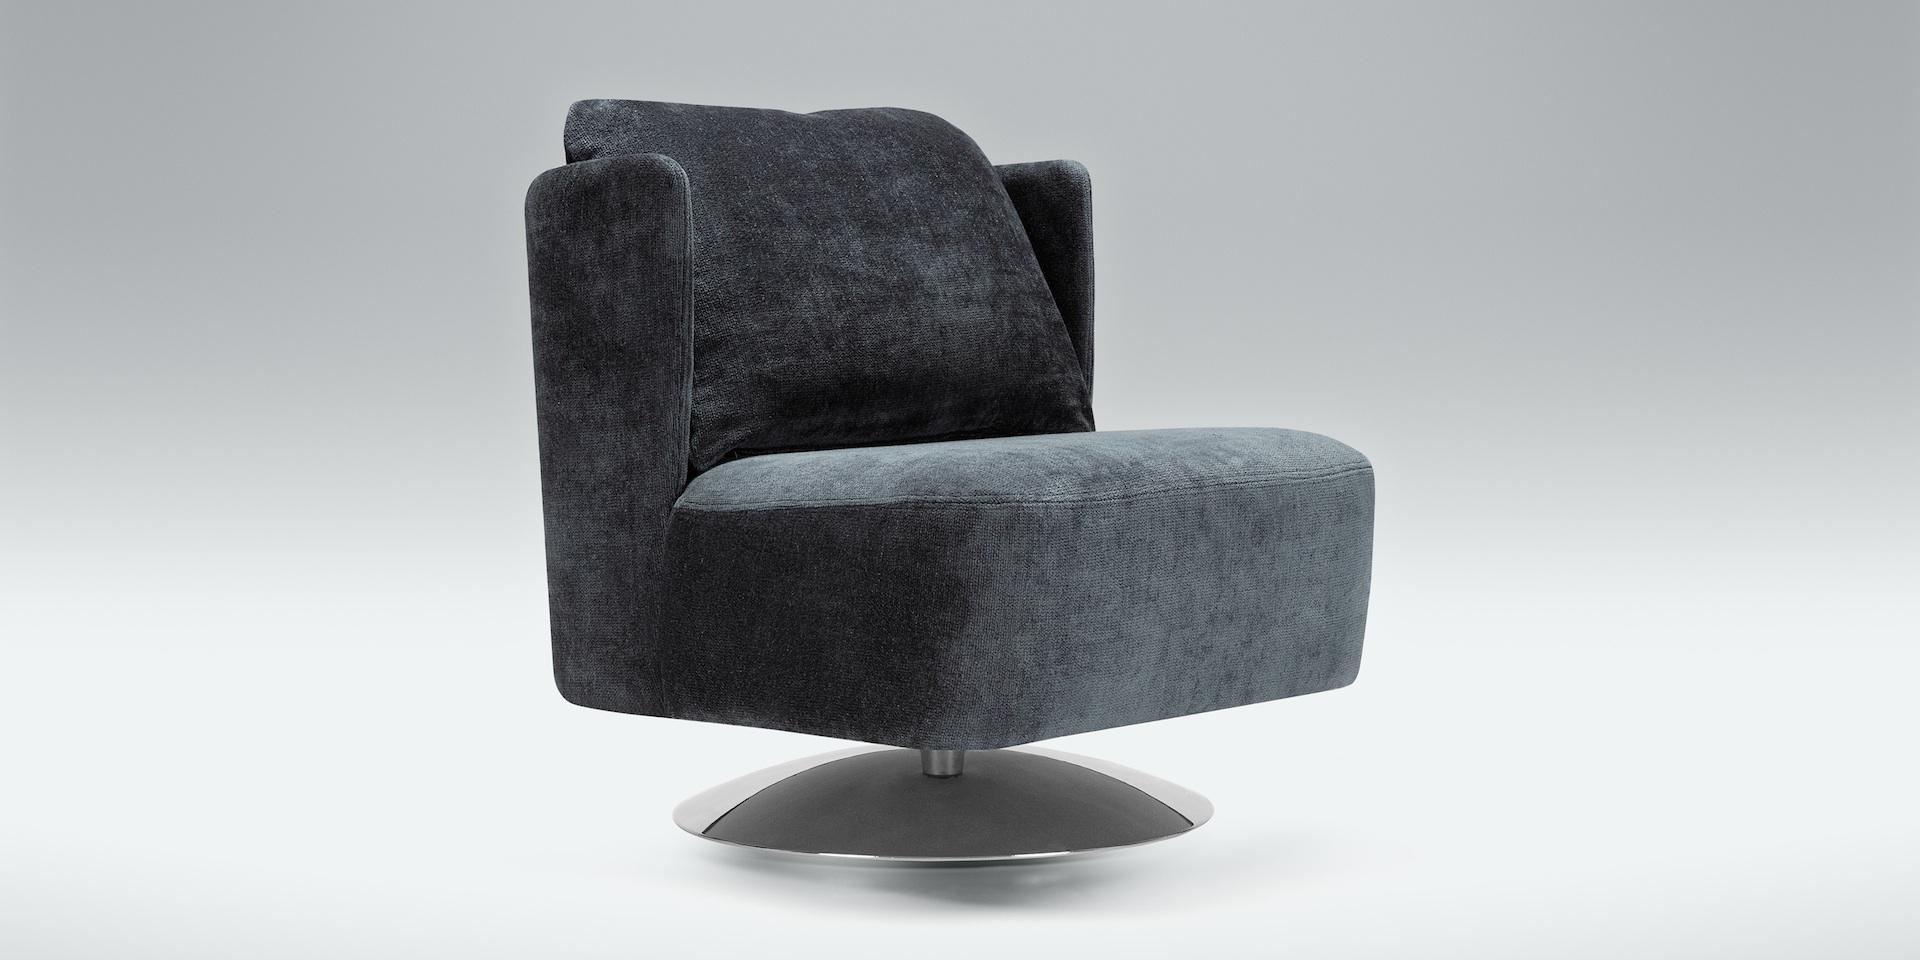 ALMA_shadow_armchair_swivel_specchio4_navy_blue_2